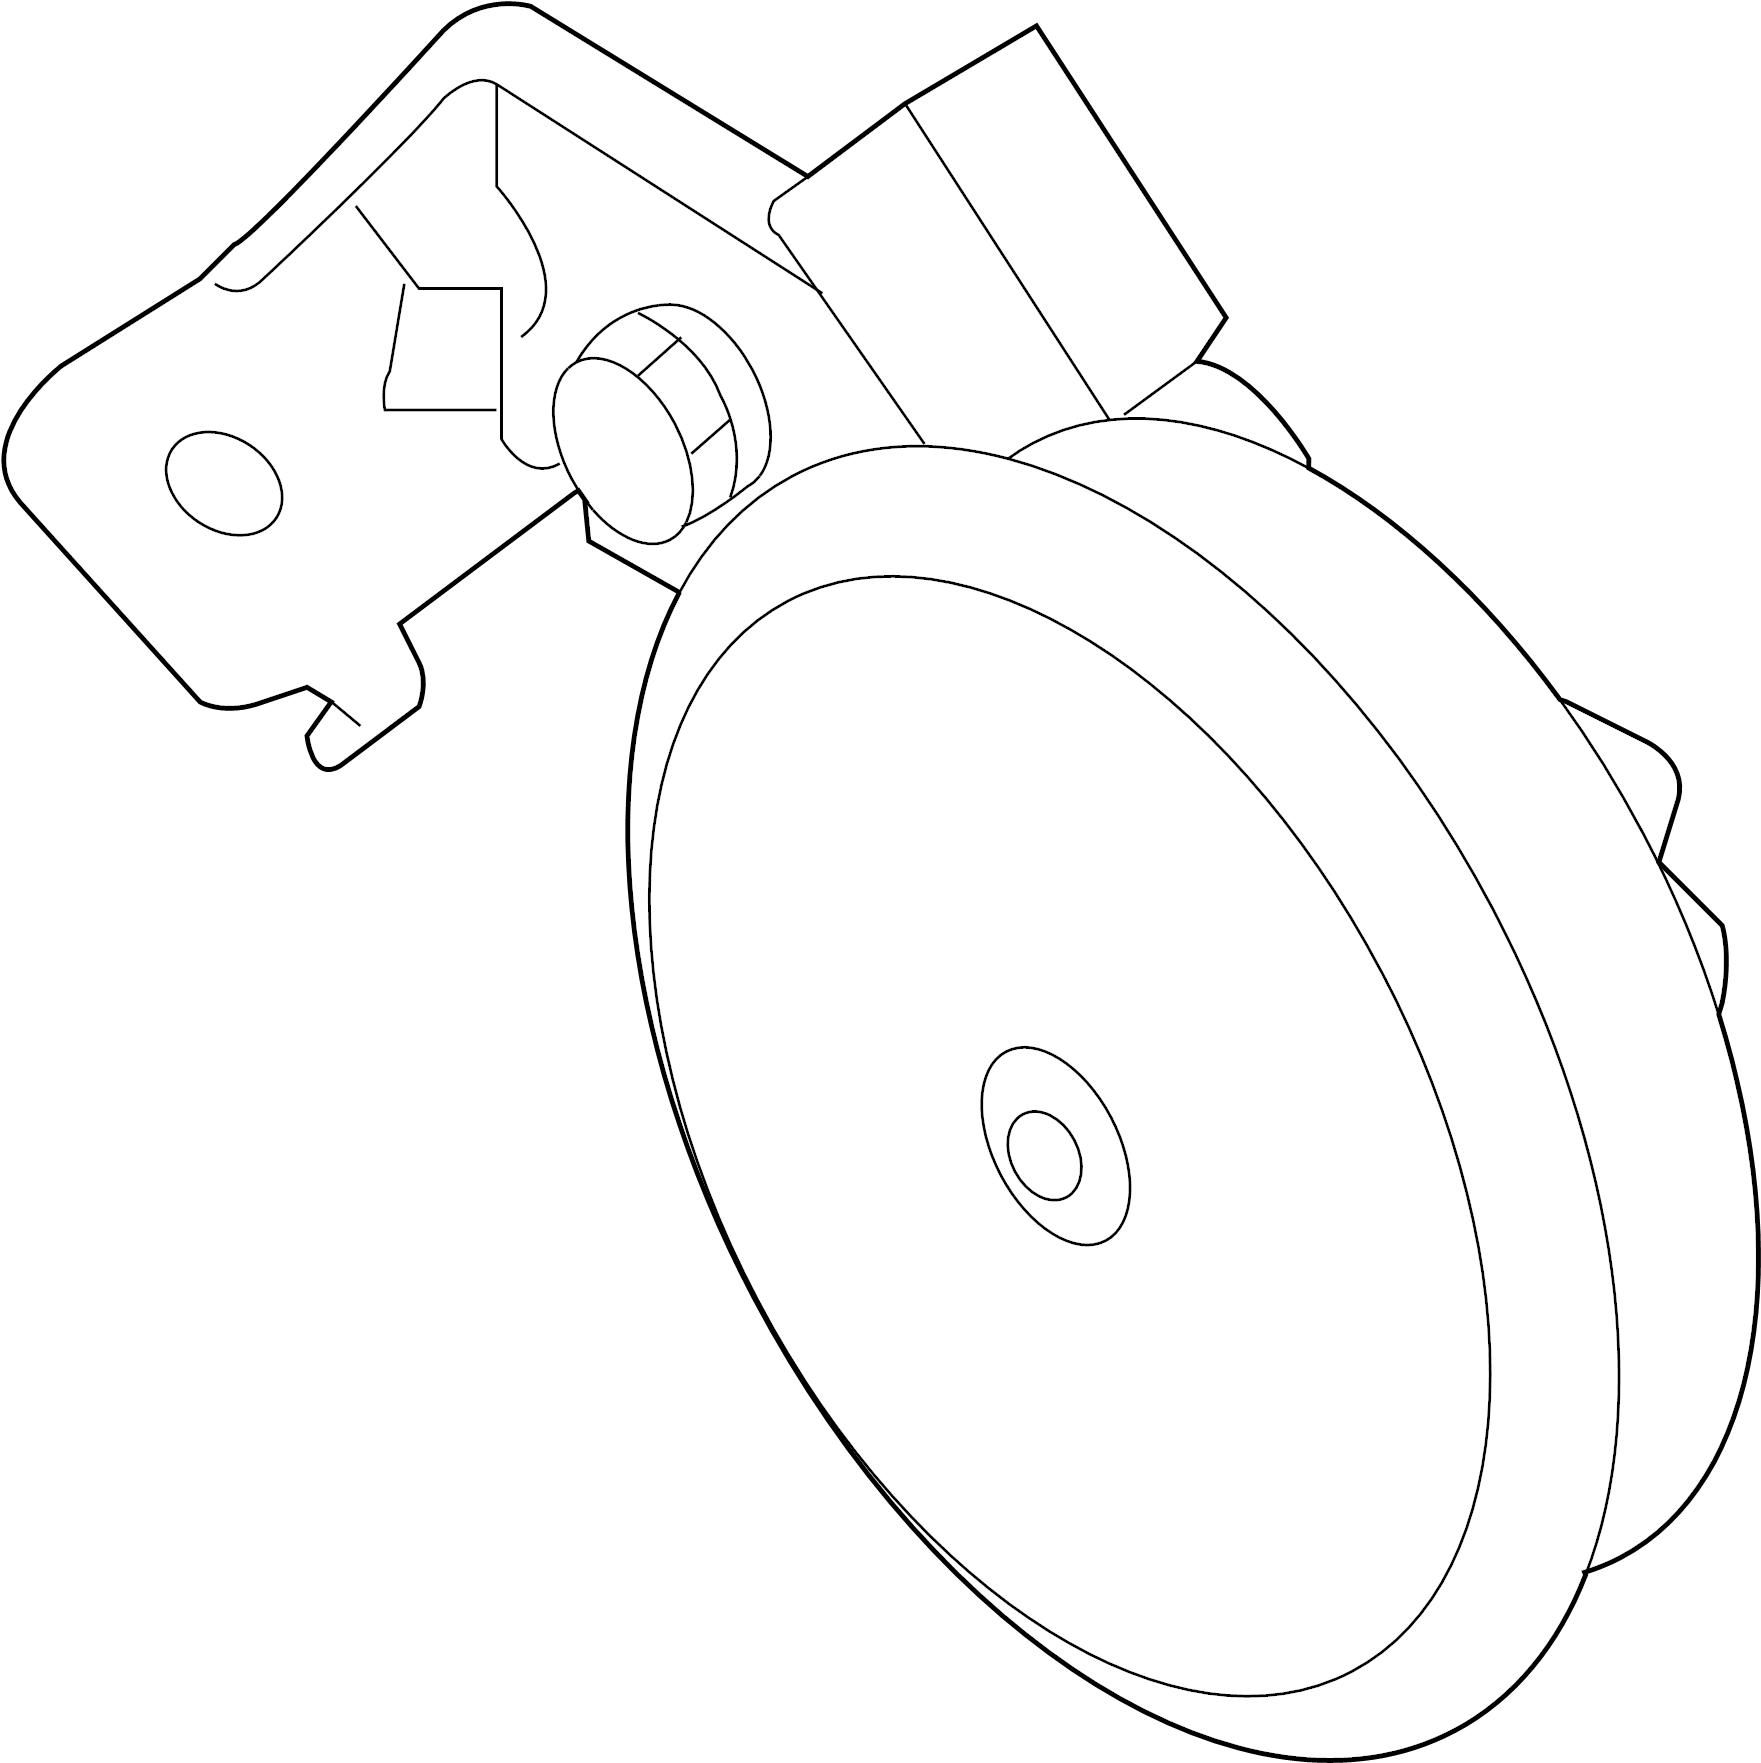 966302s000 - hyundai horn assembly